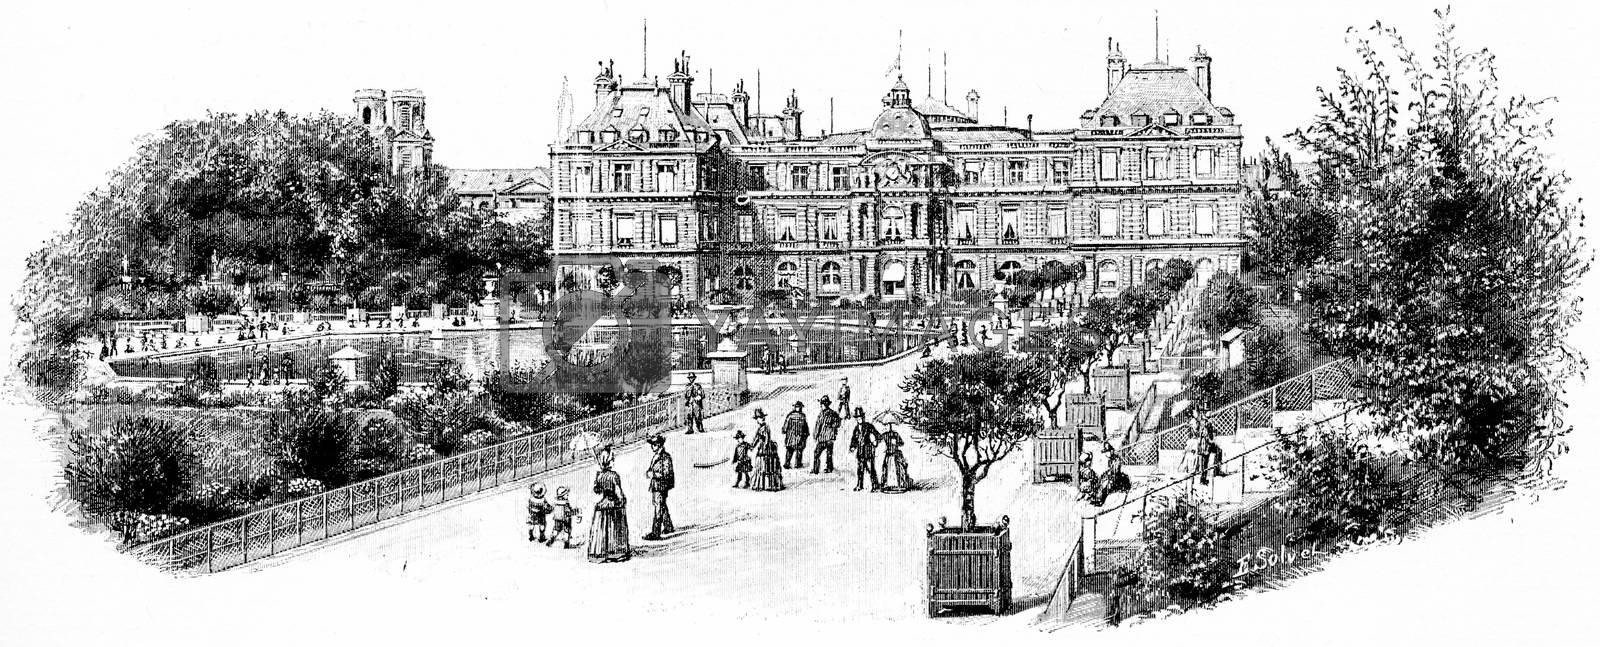 The grand facade of the Palace Garden, vintage engraved illustration. Paris - Auguste VITU – 1890.